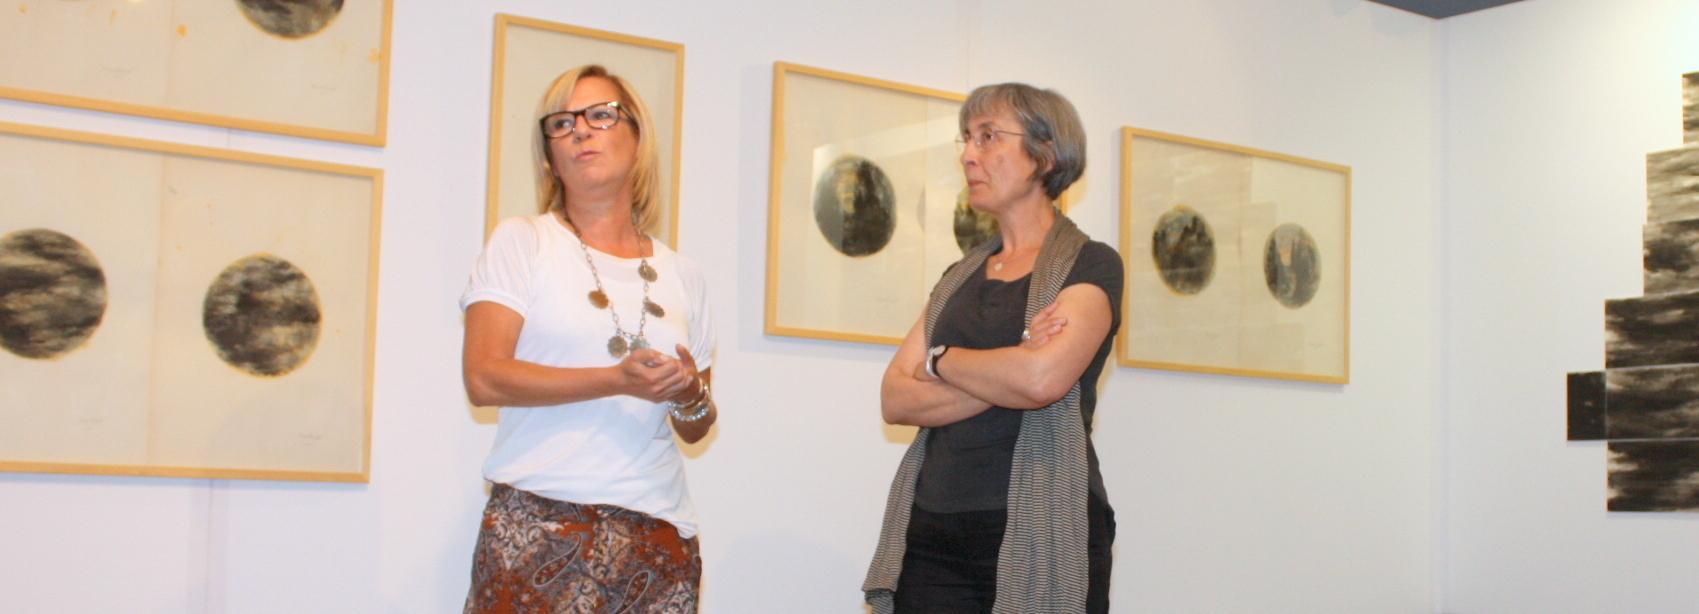 Margarida Lagarto expõe na Galeria Municipal de Arte